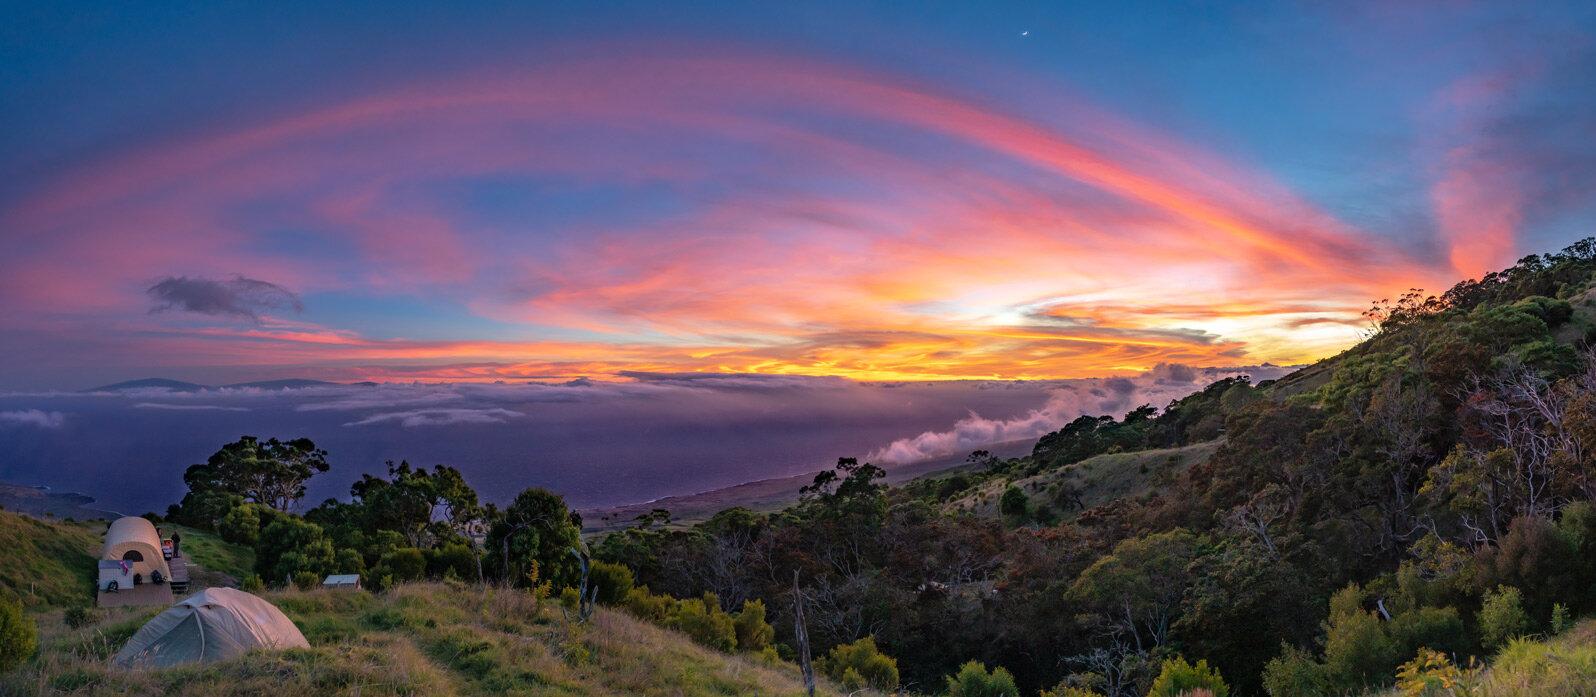 Nakula-Sunset-Pano.jpg